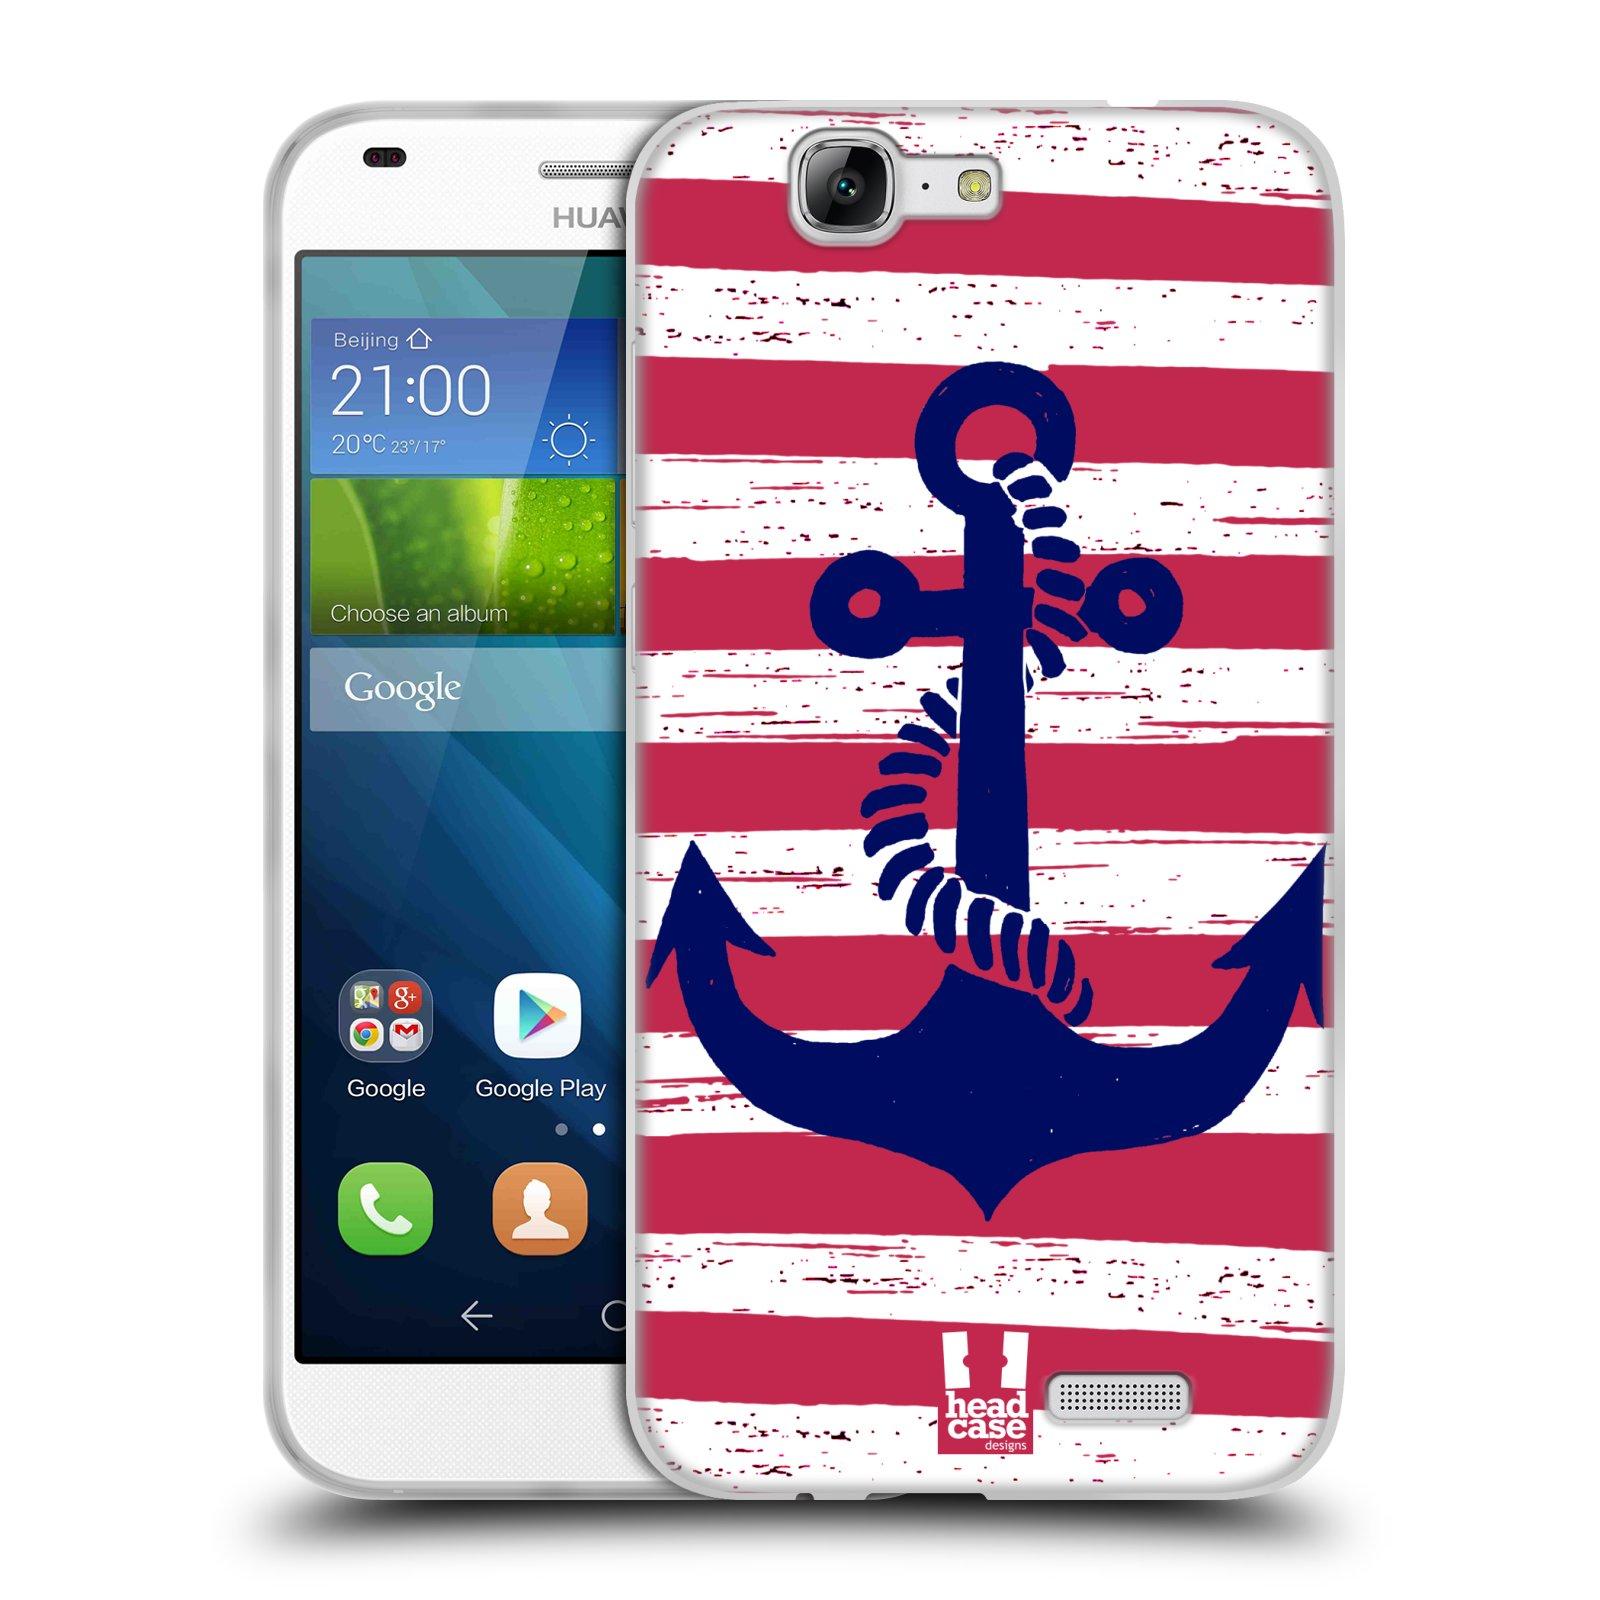 Silikonové pouzdro na mobil Huawei Ascend G7 HEAD CASE KOTVA S PRUHY